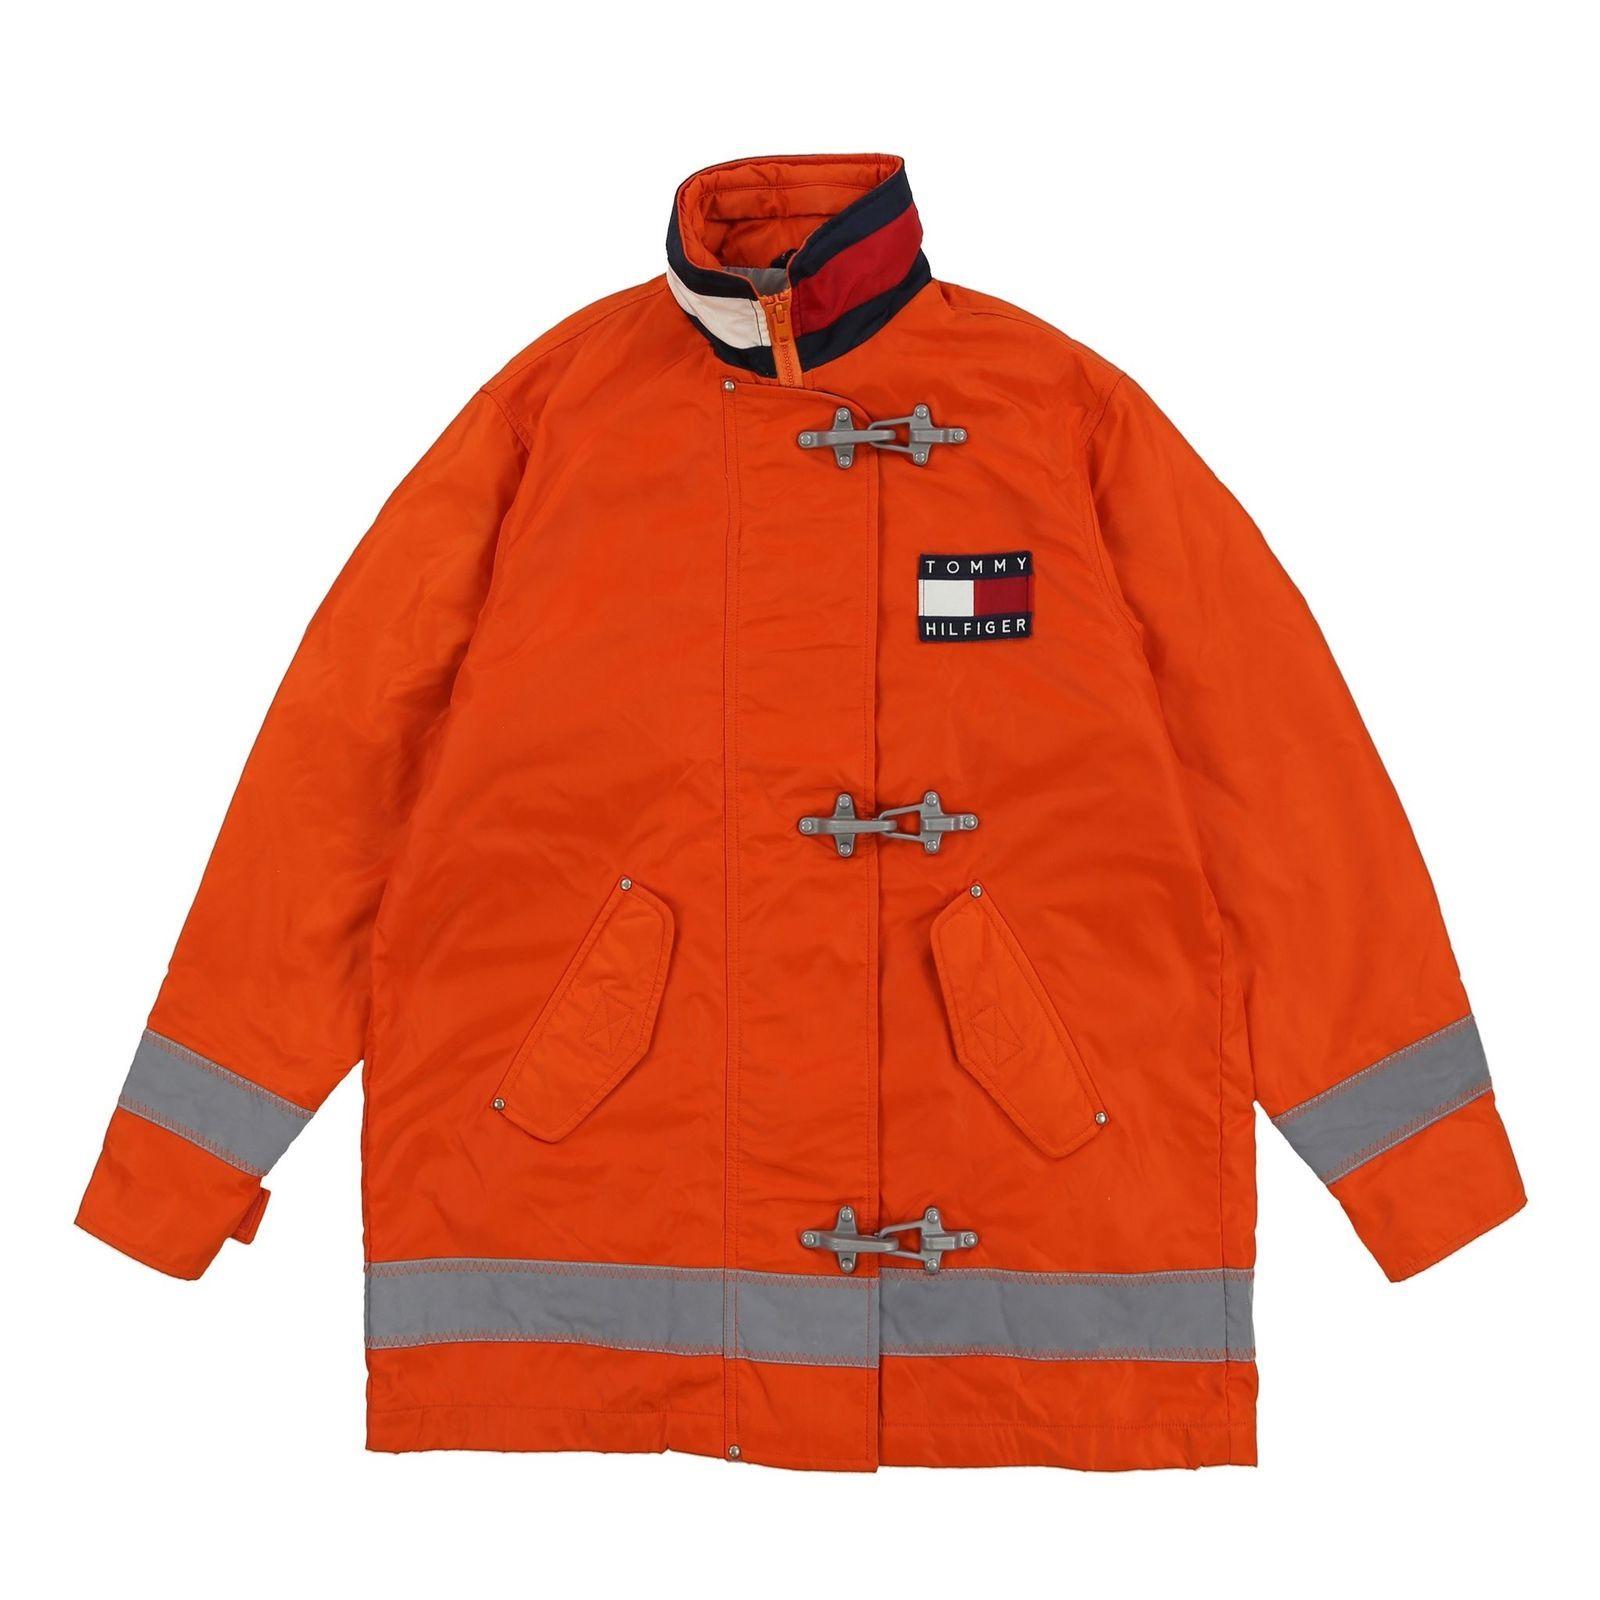 Vintage Tommy Hilfiger Reflective Fireman Clasp Jacket Ebay [ 1600 x 1600 Pixel ]